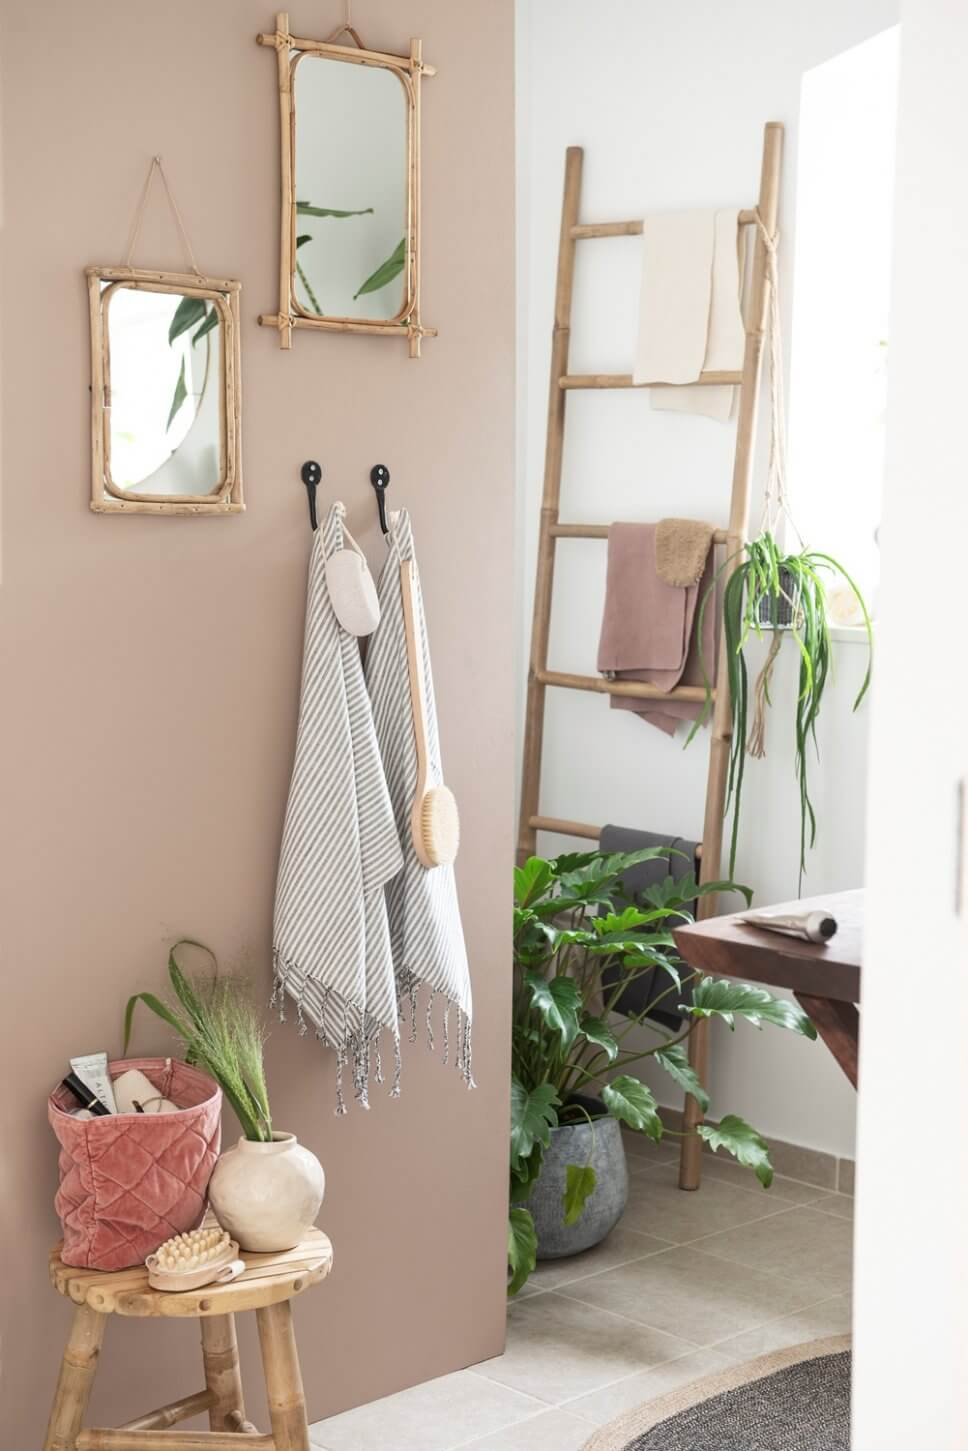 Handtuchleiter in rustikalem Badezimmer